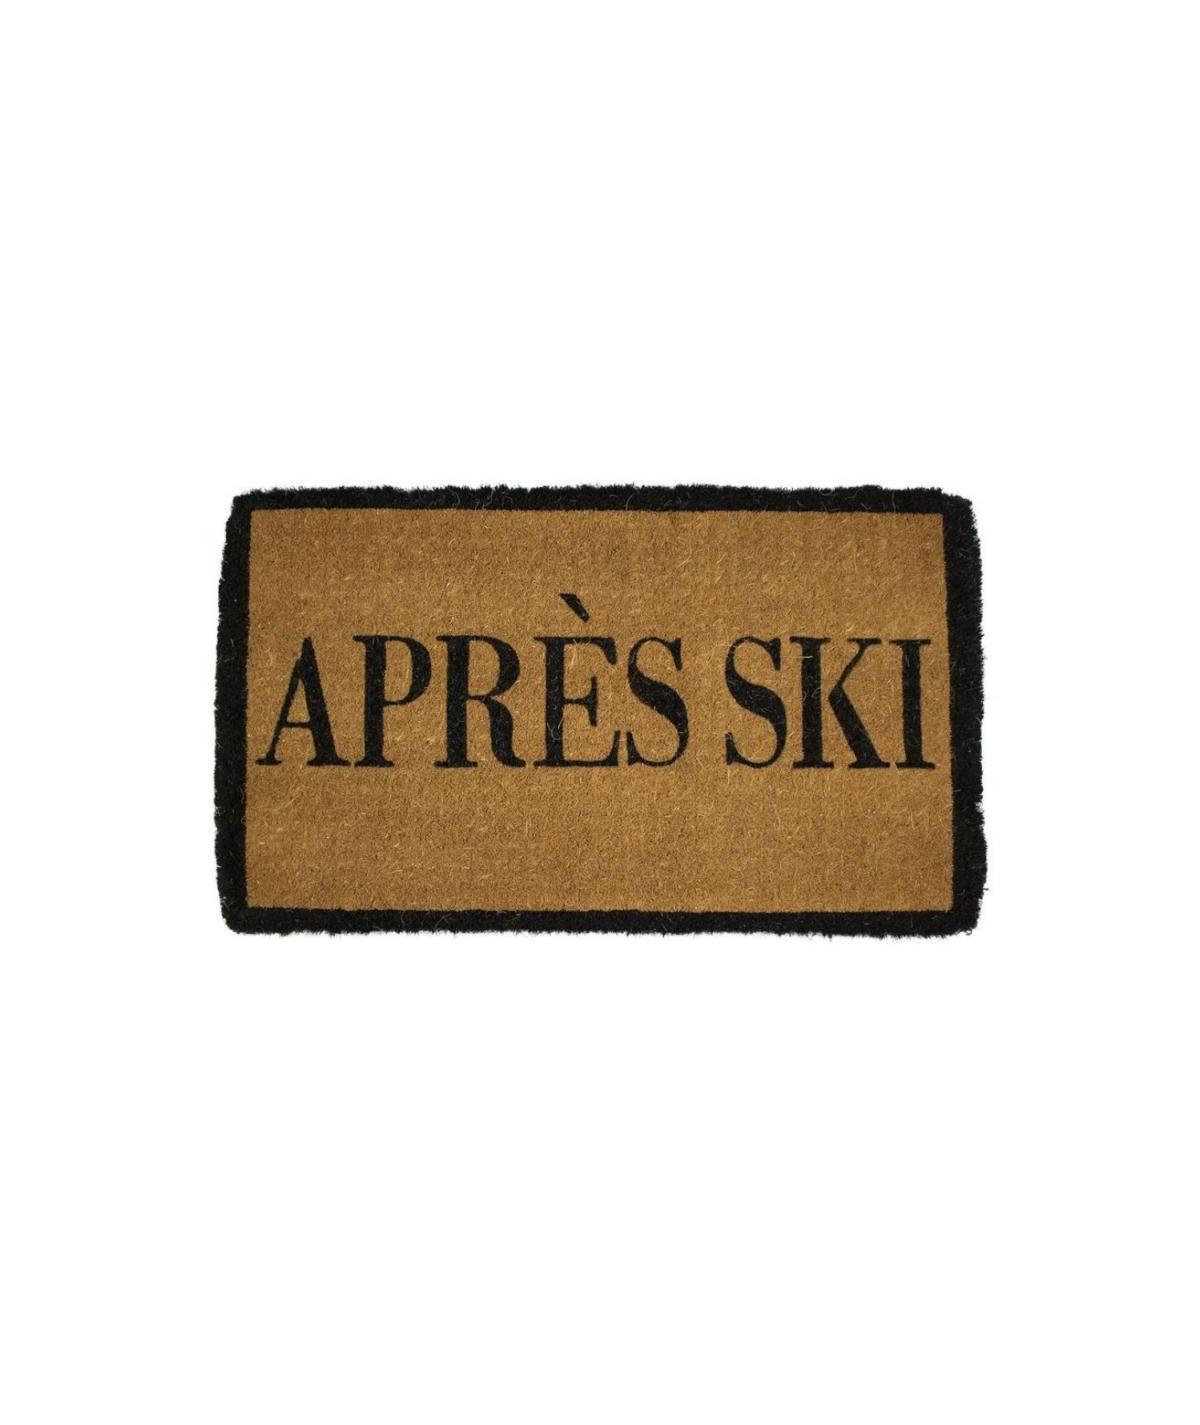 Paillasson coco fait main 75x45cm - Après Ski | Yesdeko